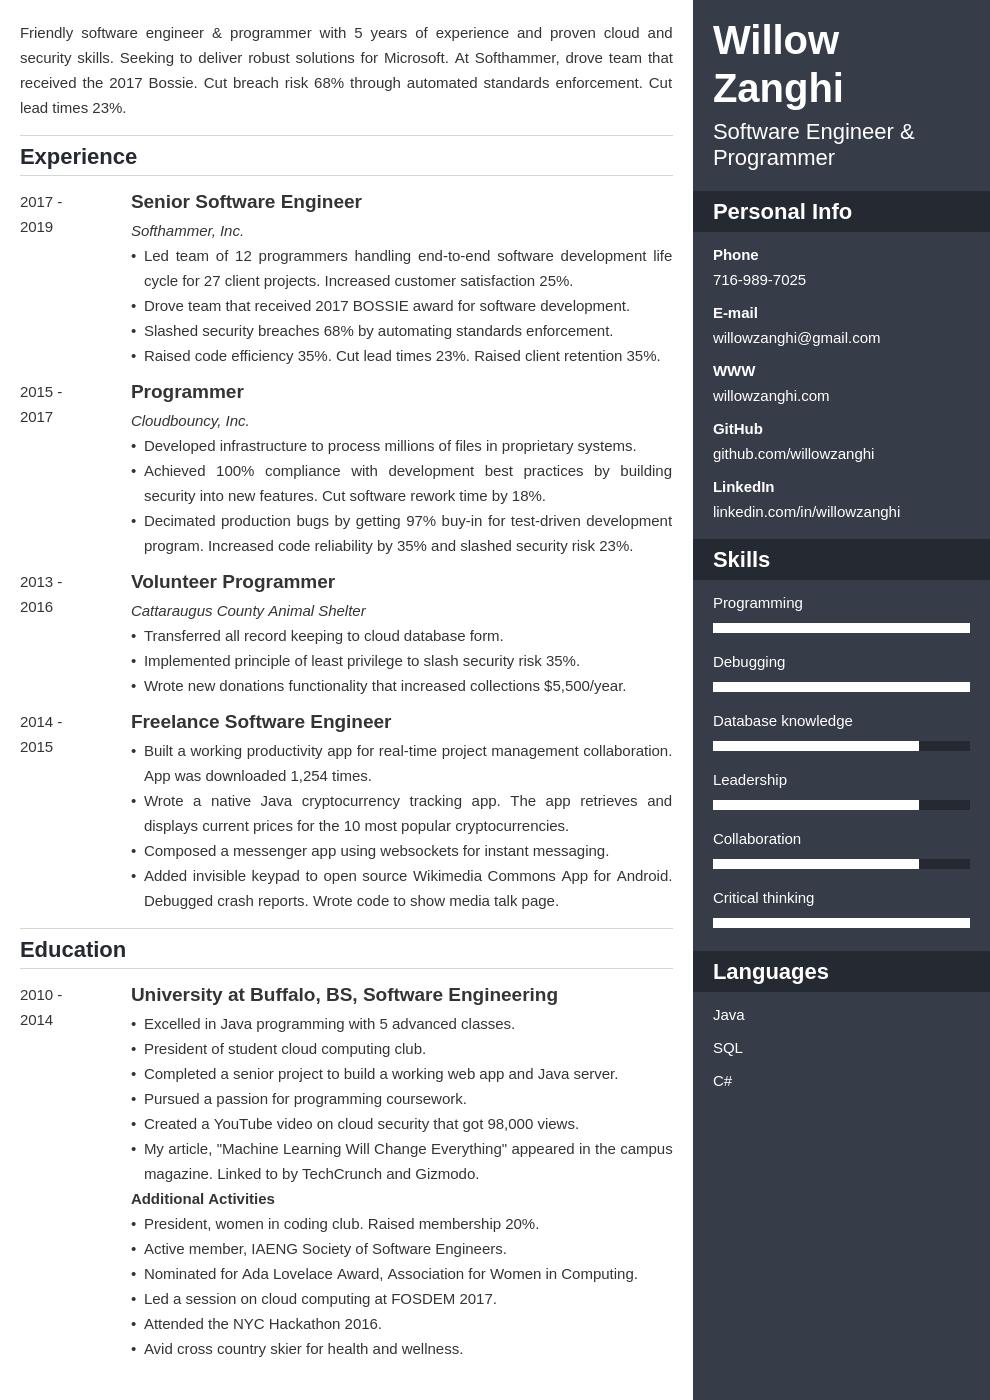 resume chronological template enfold uk